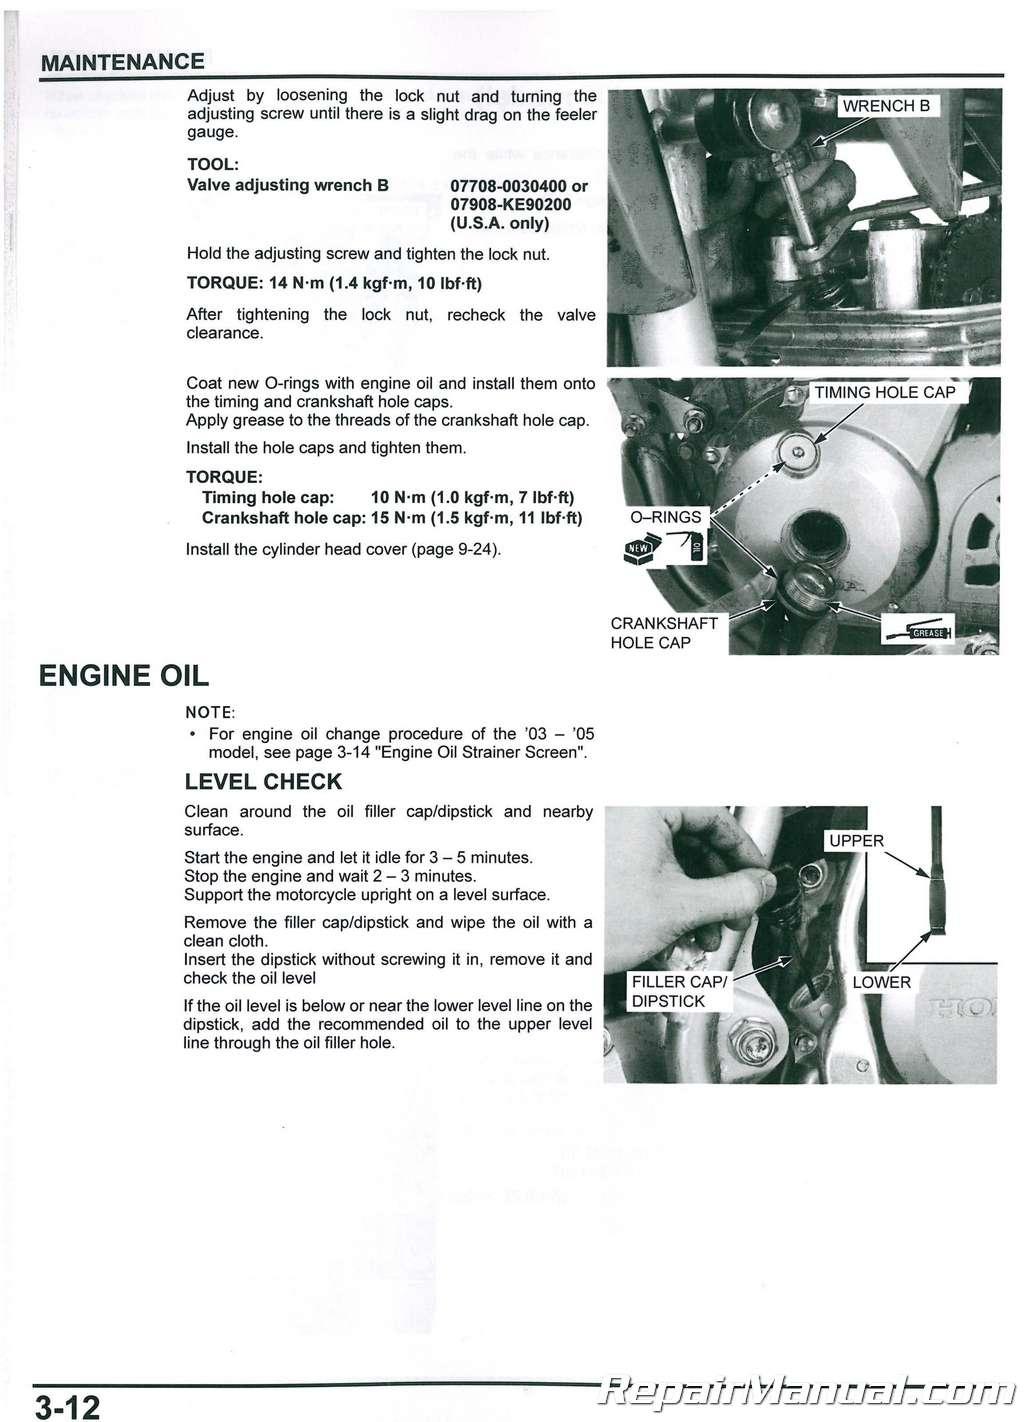 2003 2017 honda crf150f motorcycle service manual rh repairmanual com 2013 Honda CRF150F Honda CRF450R